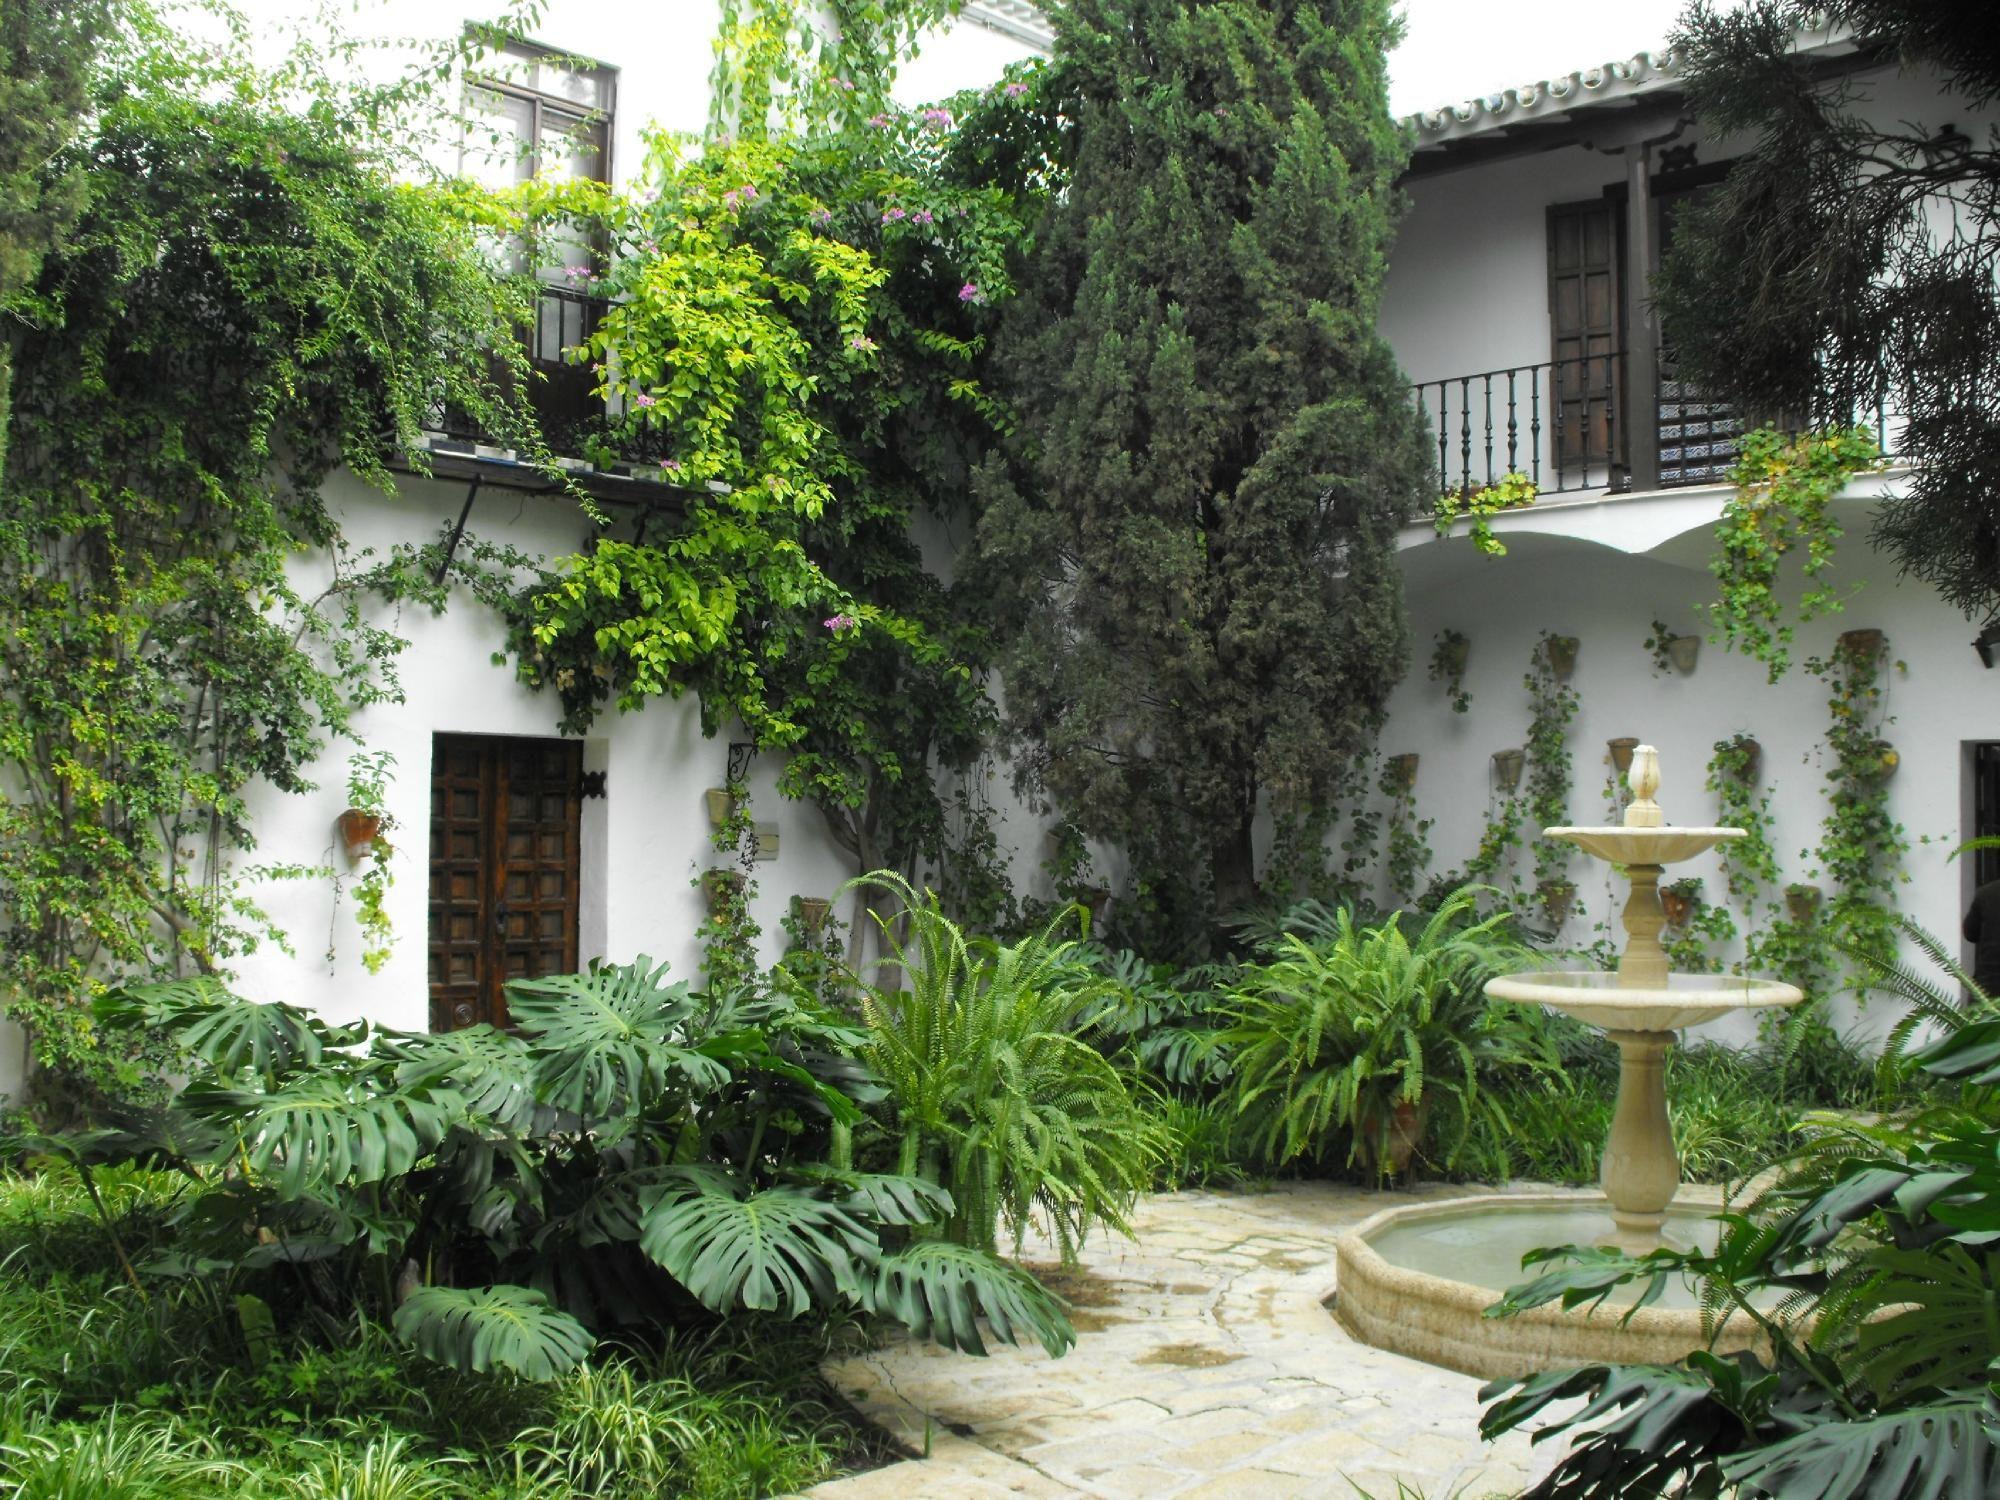 Hotel Cortijo El Esparragal (Spain/Gerena, Province of Seville) - Farmhouse Reviews, Photos & Price Comparison - TripAdvisor